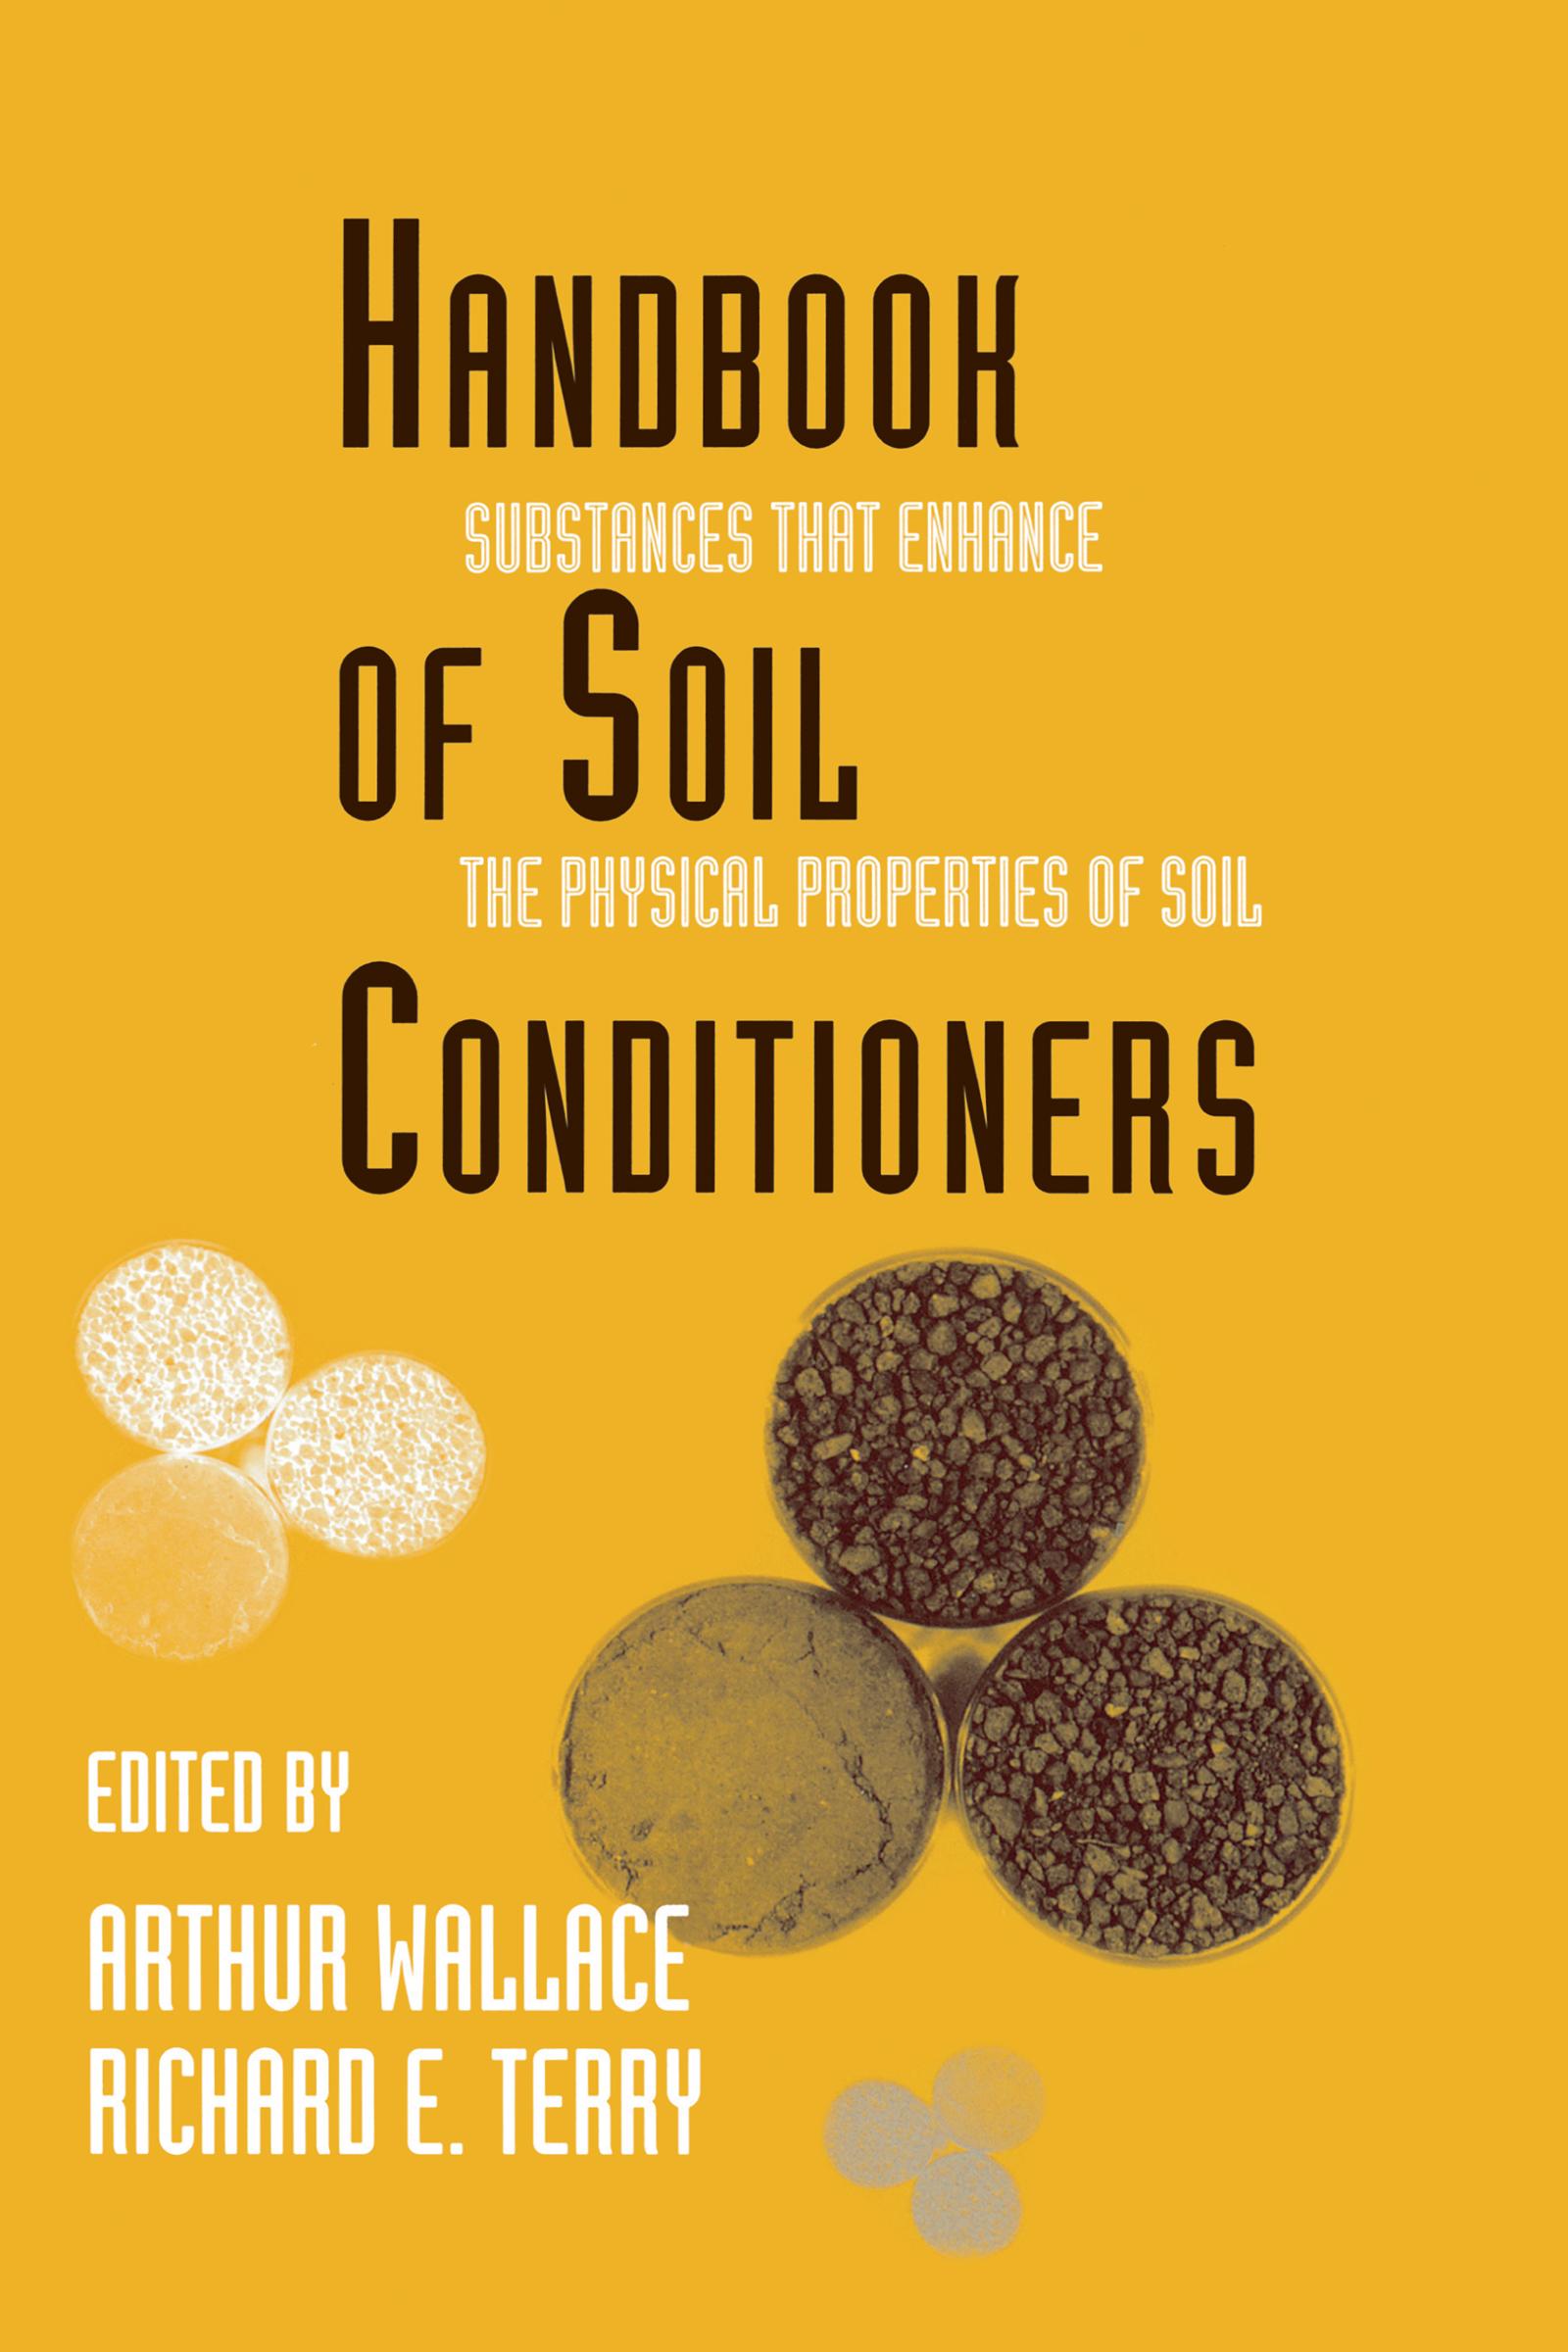 Handbook of Soil Conditioners